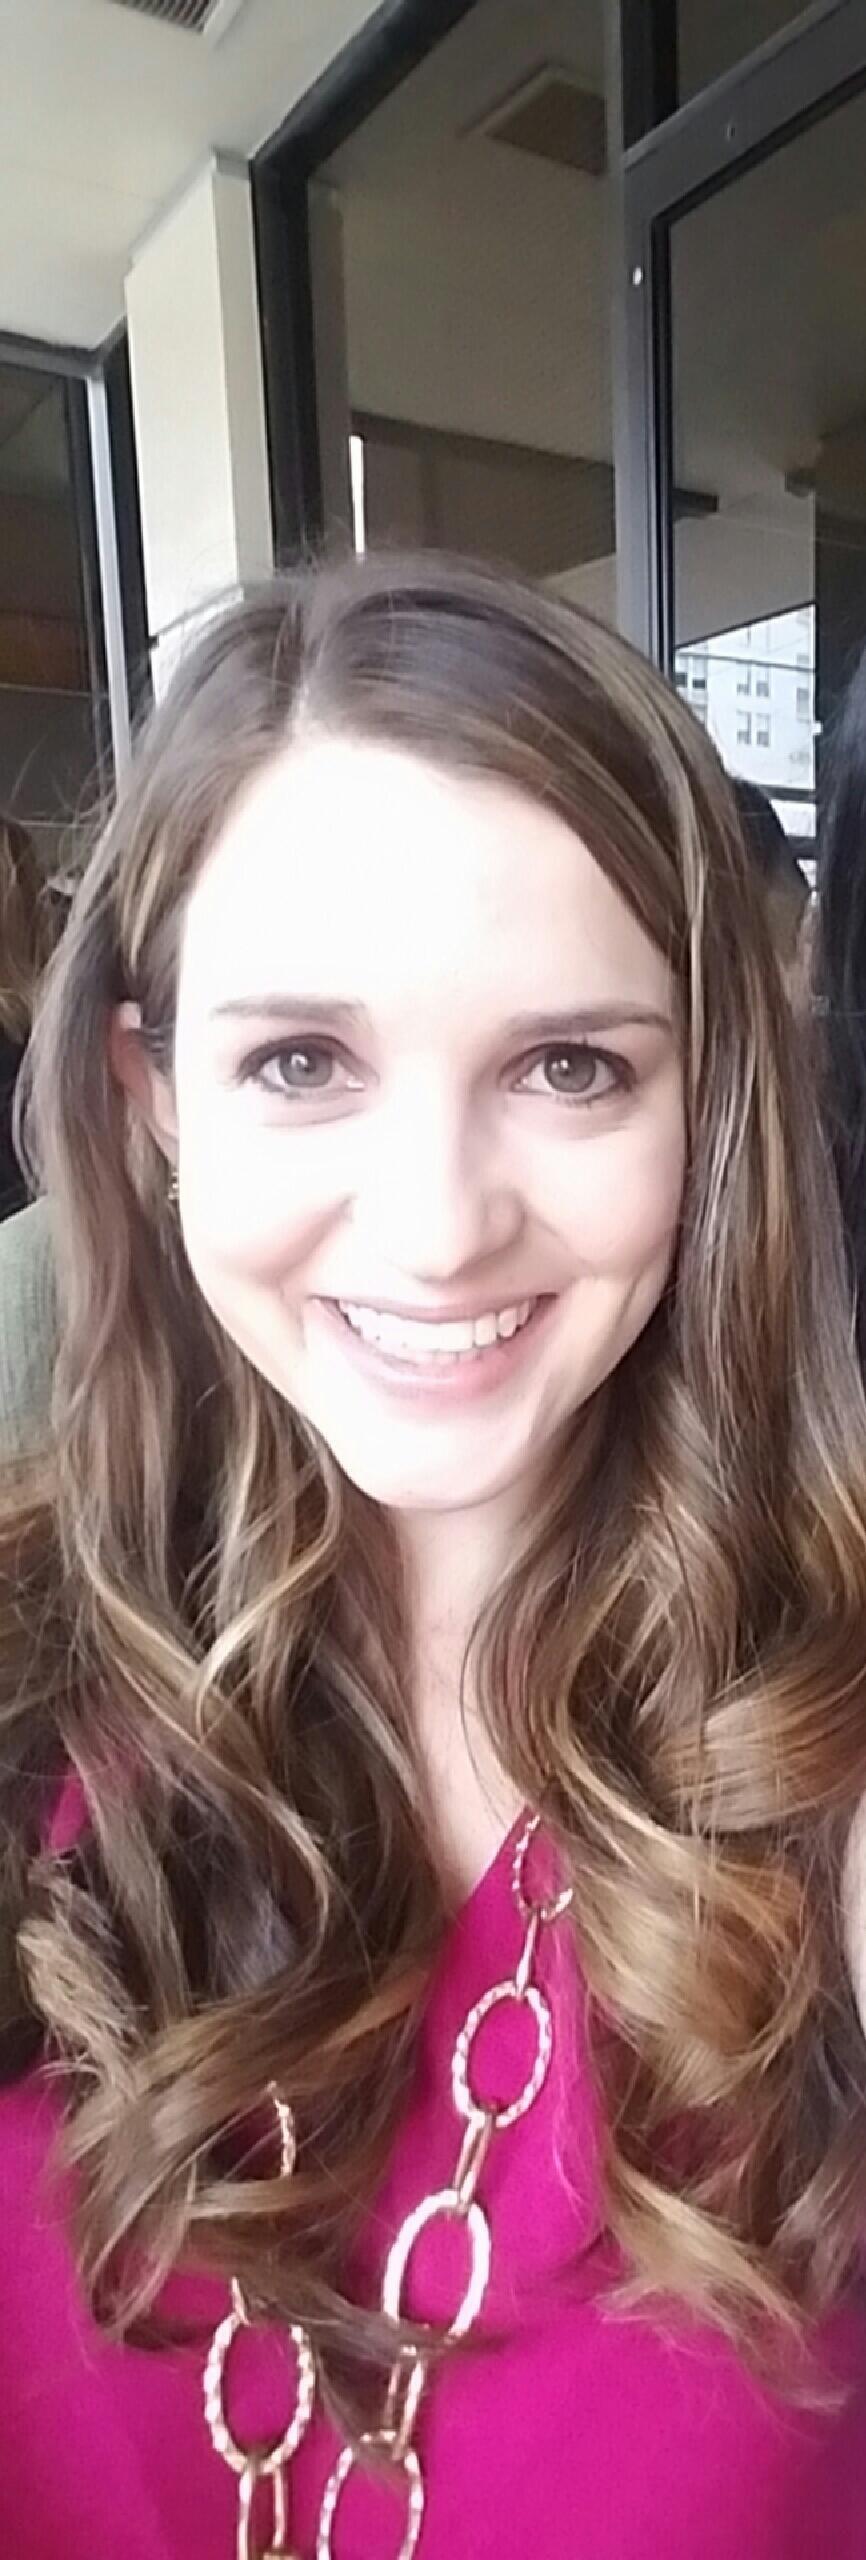 Allison S.